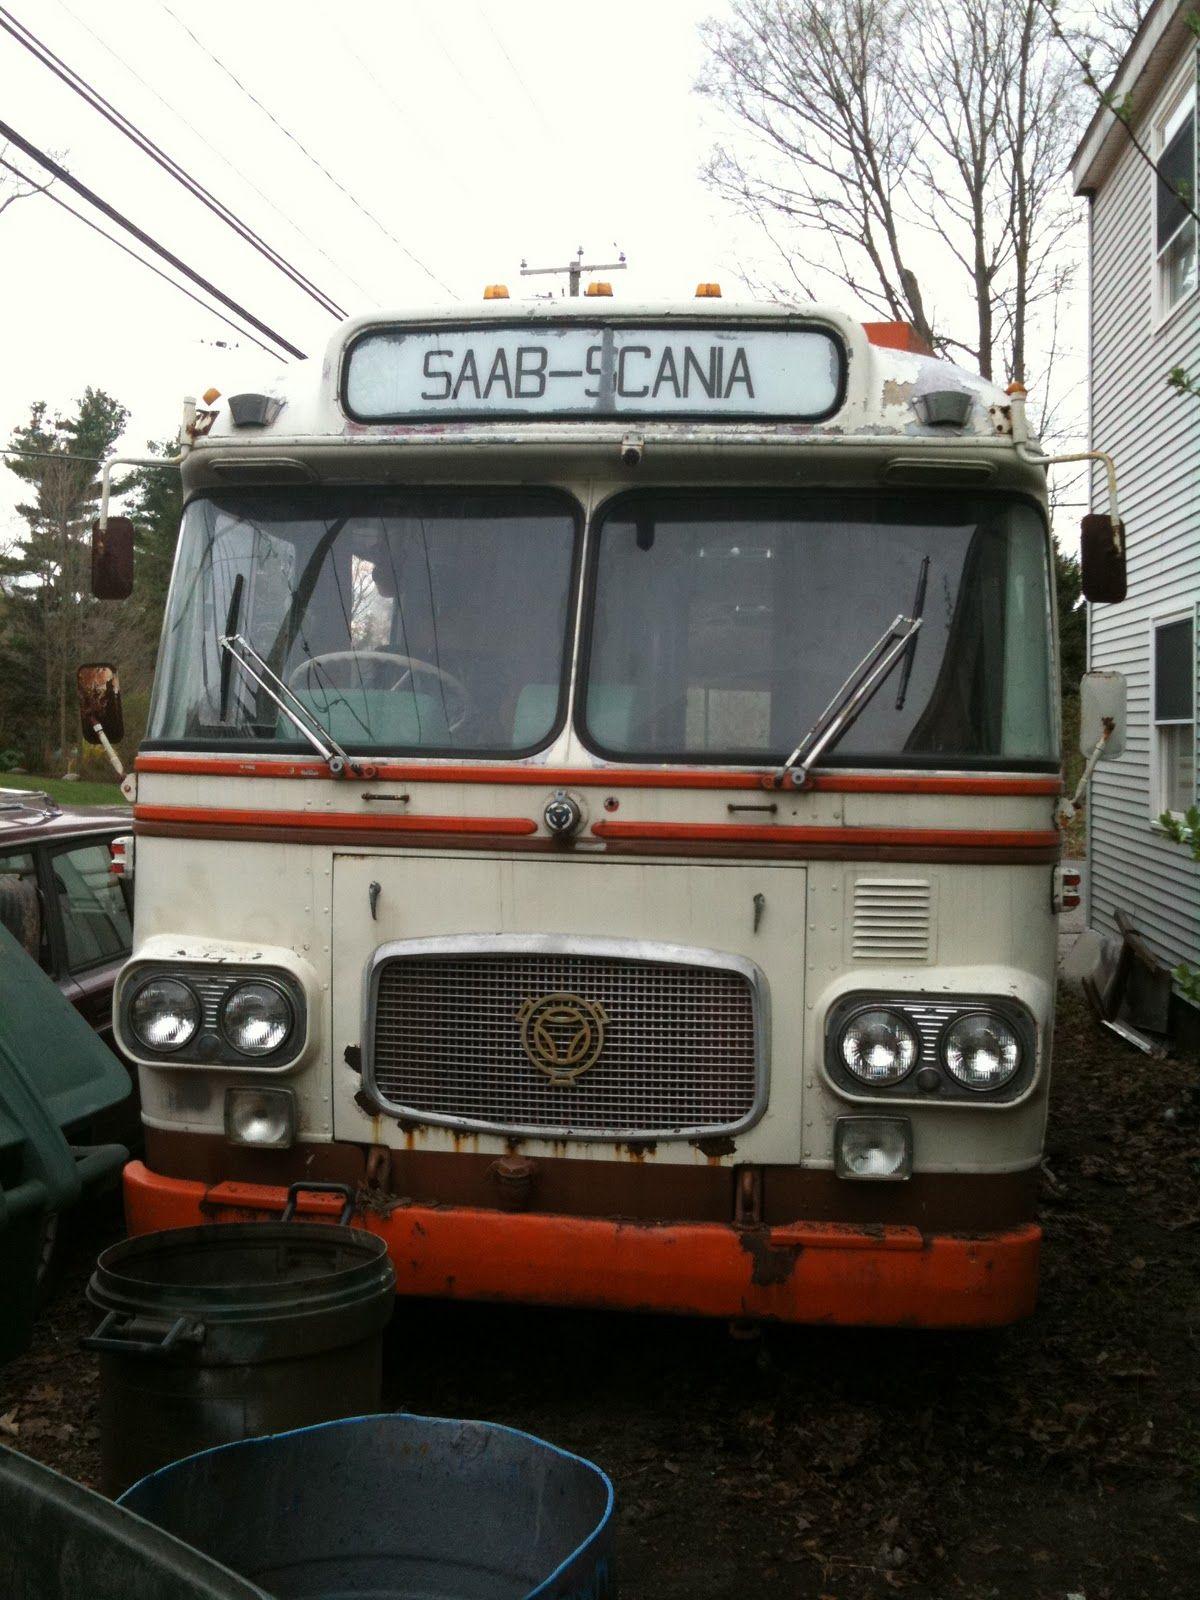 Scania CF76 Commercial vehicle, Bus, Vintage trucks